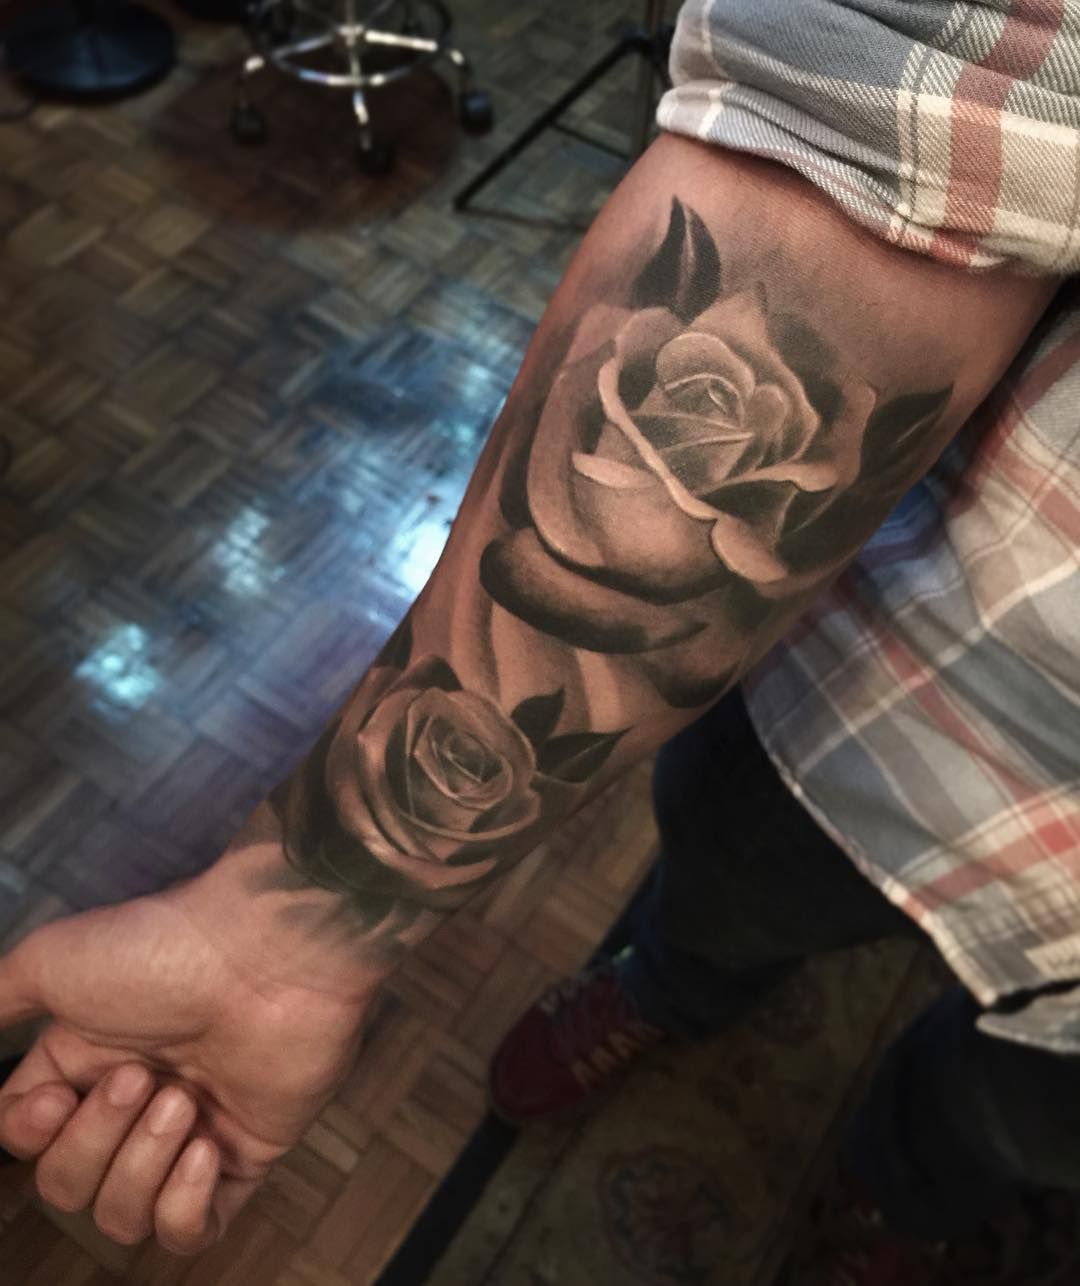 Soft Blackwork Roses Tatuajes Tatuajes De Rosas Tatuajes De